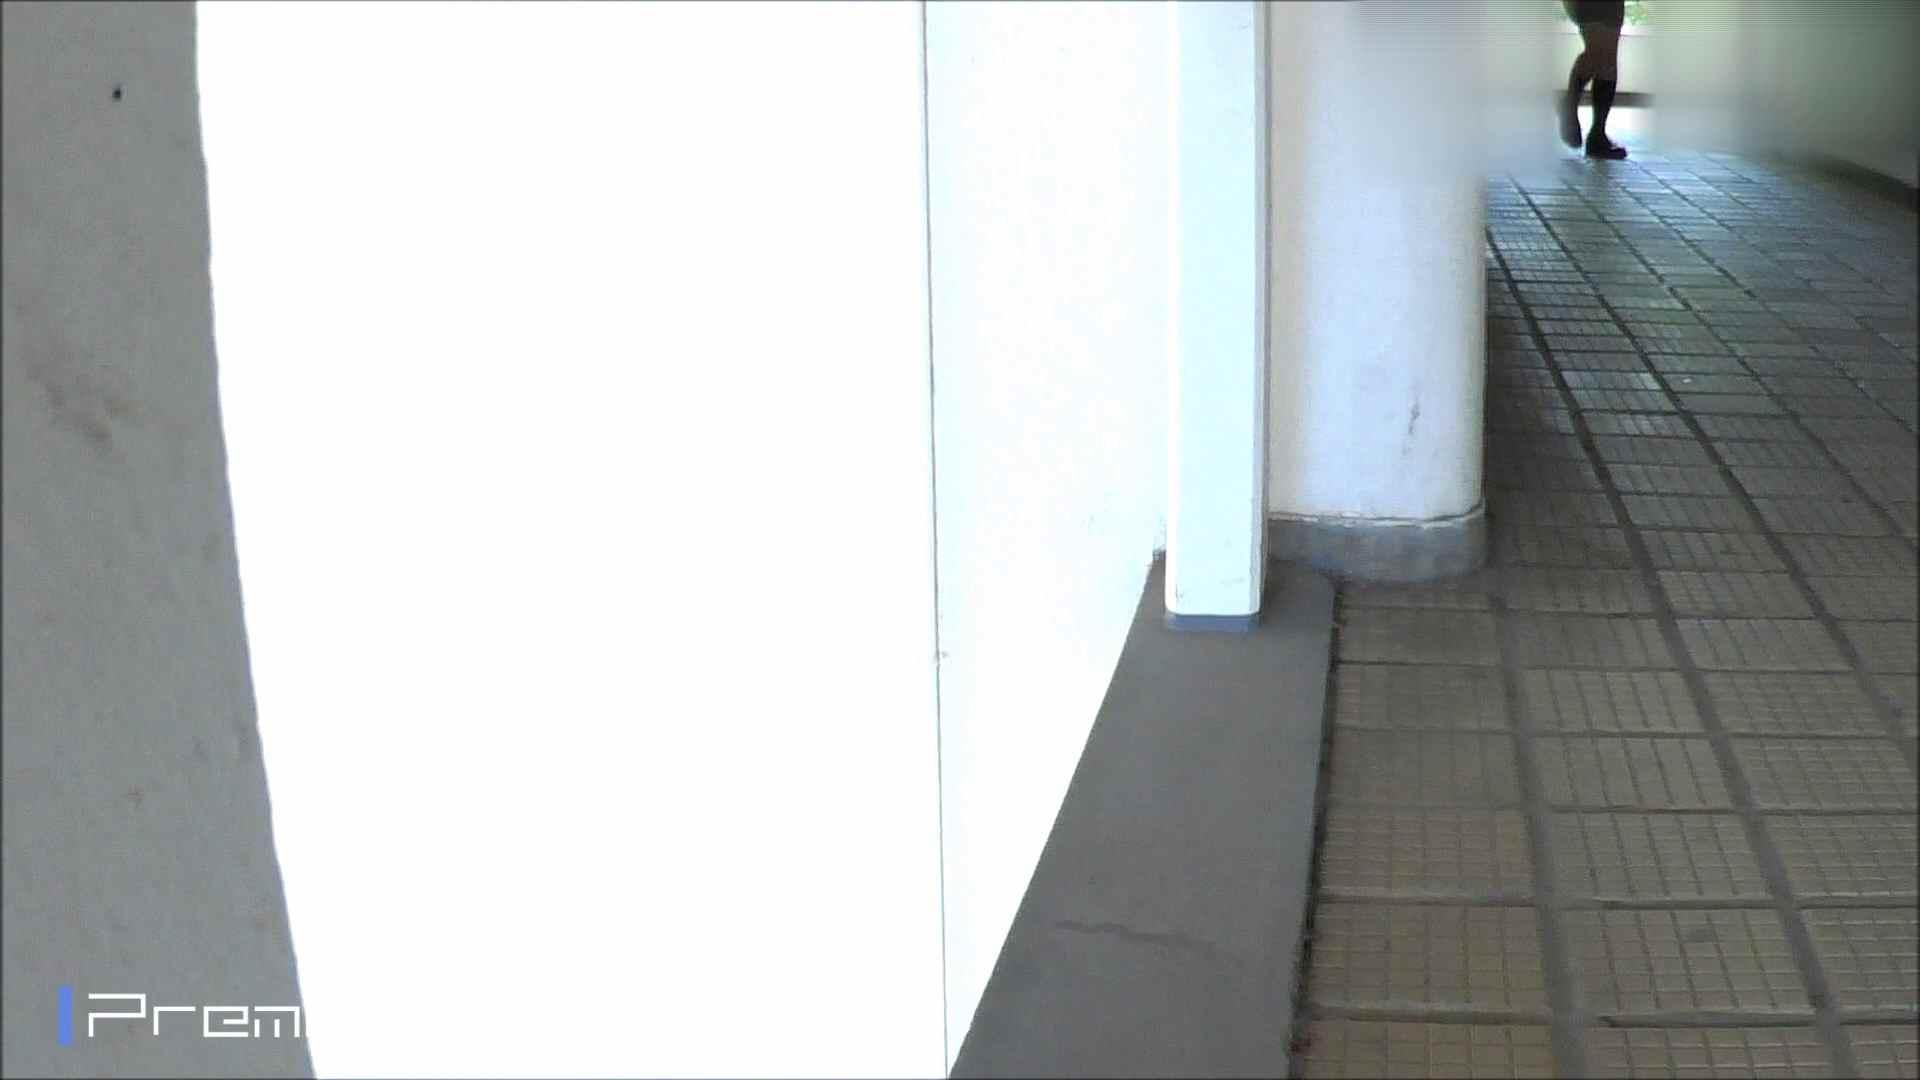 FHD激カワ!激やば! 復讐のトイレ盗撮 Vol.03 ギャル攻め スケベ動画紹介 51画像 28